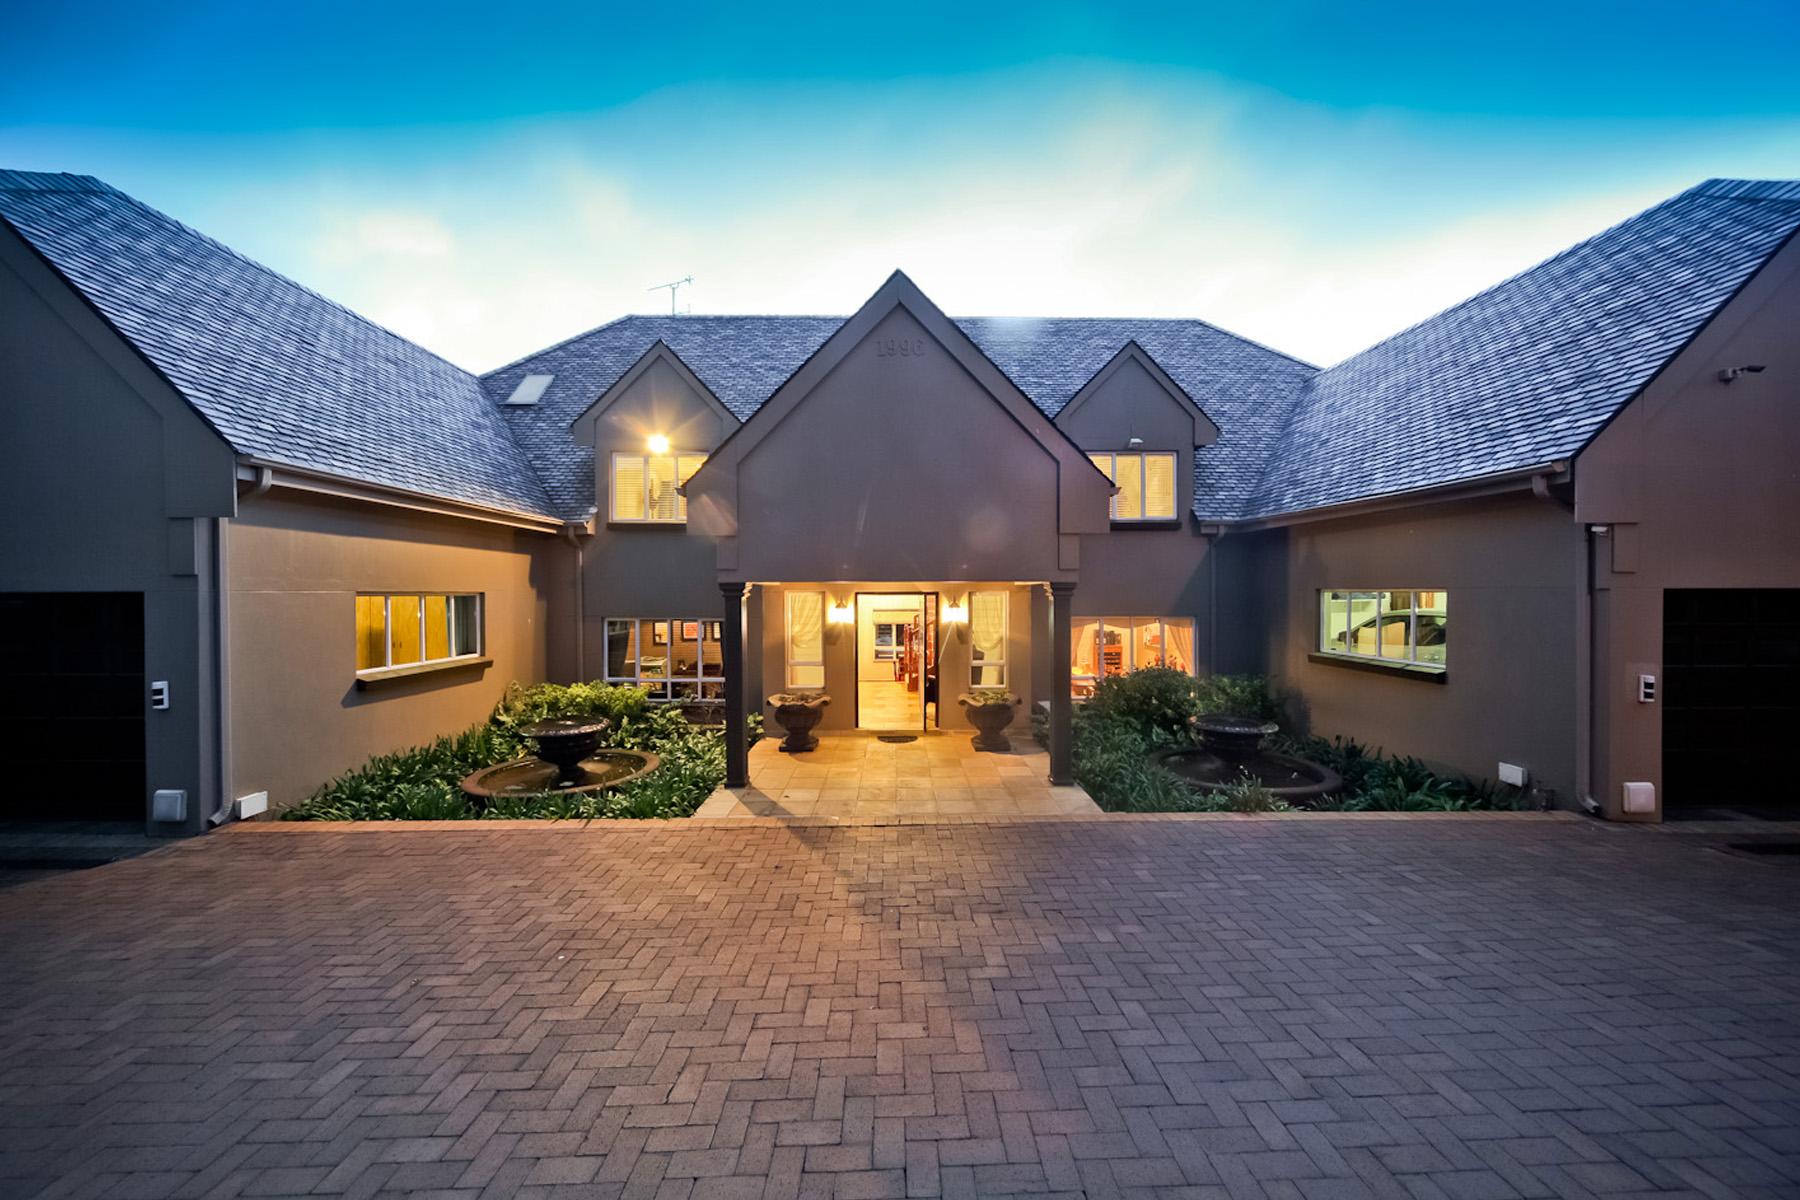 Single Family Home for Sale at Allen Grove, Bedfordview Johannesburg, Gauteng, 2007 South Africa